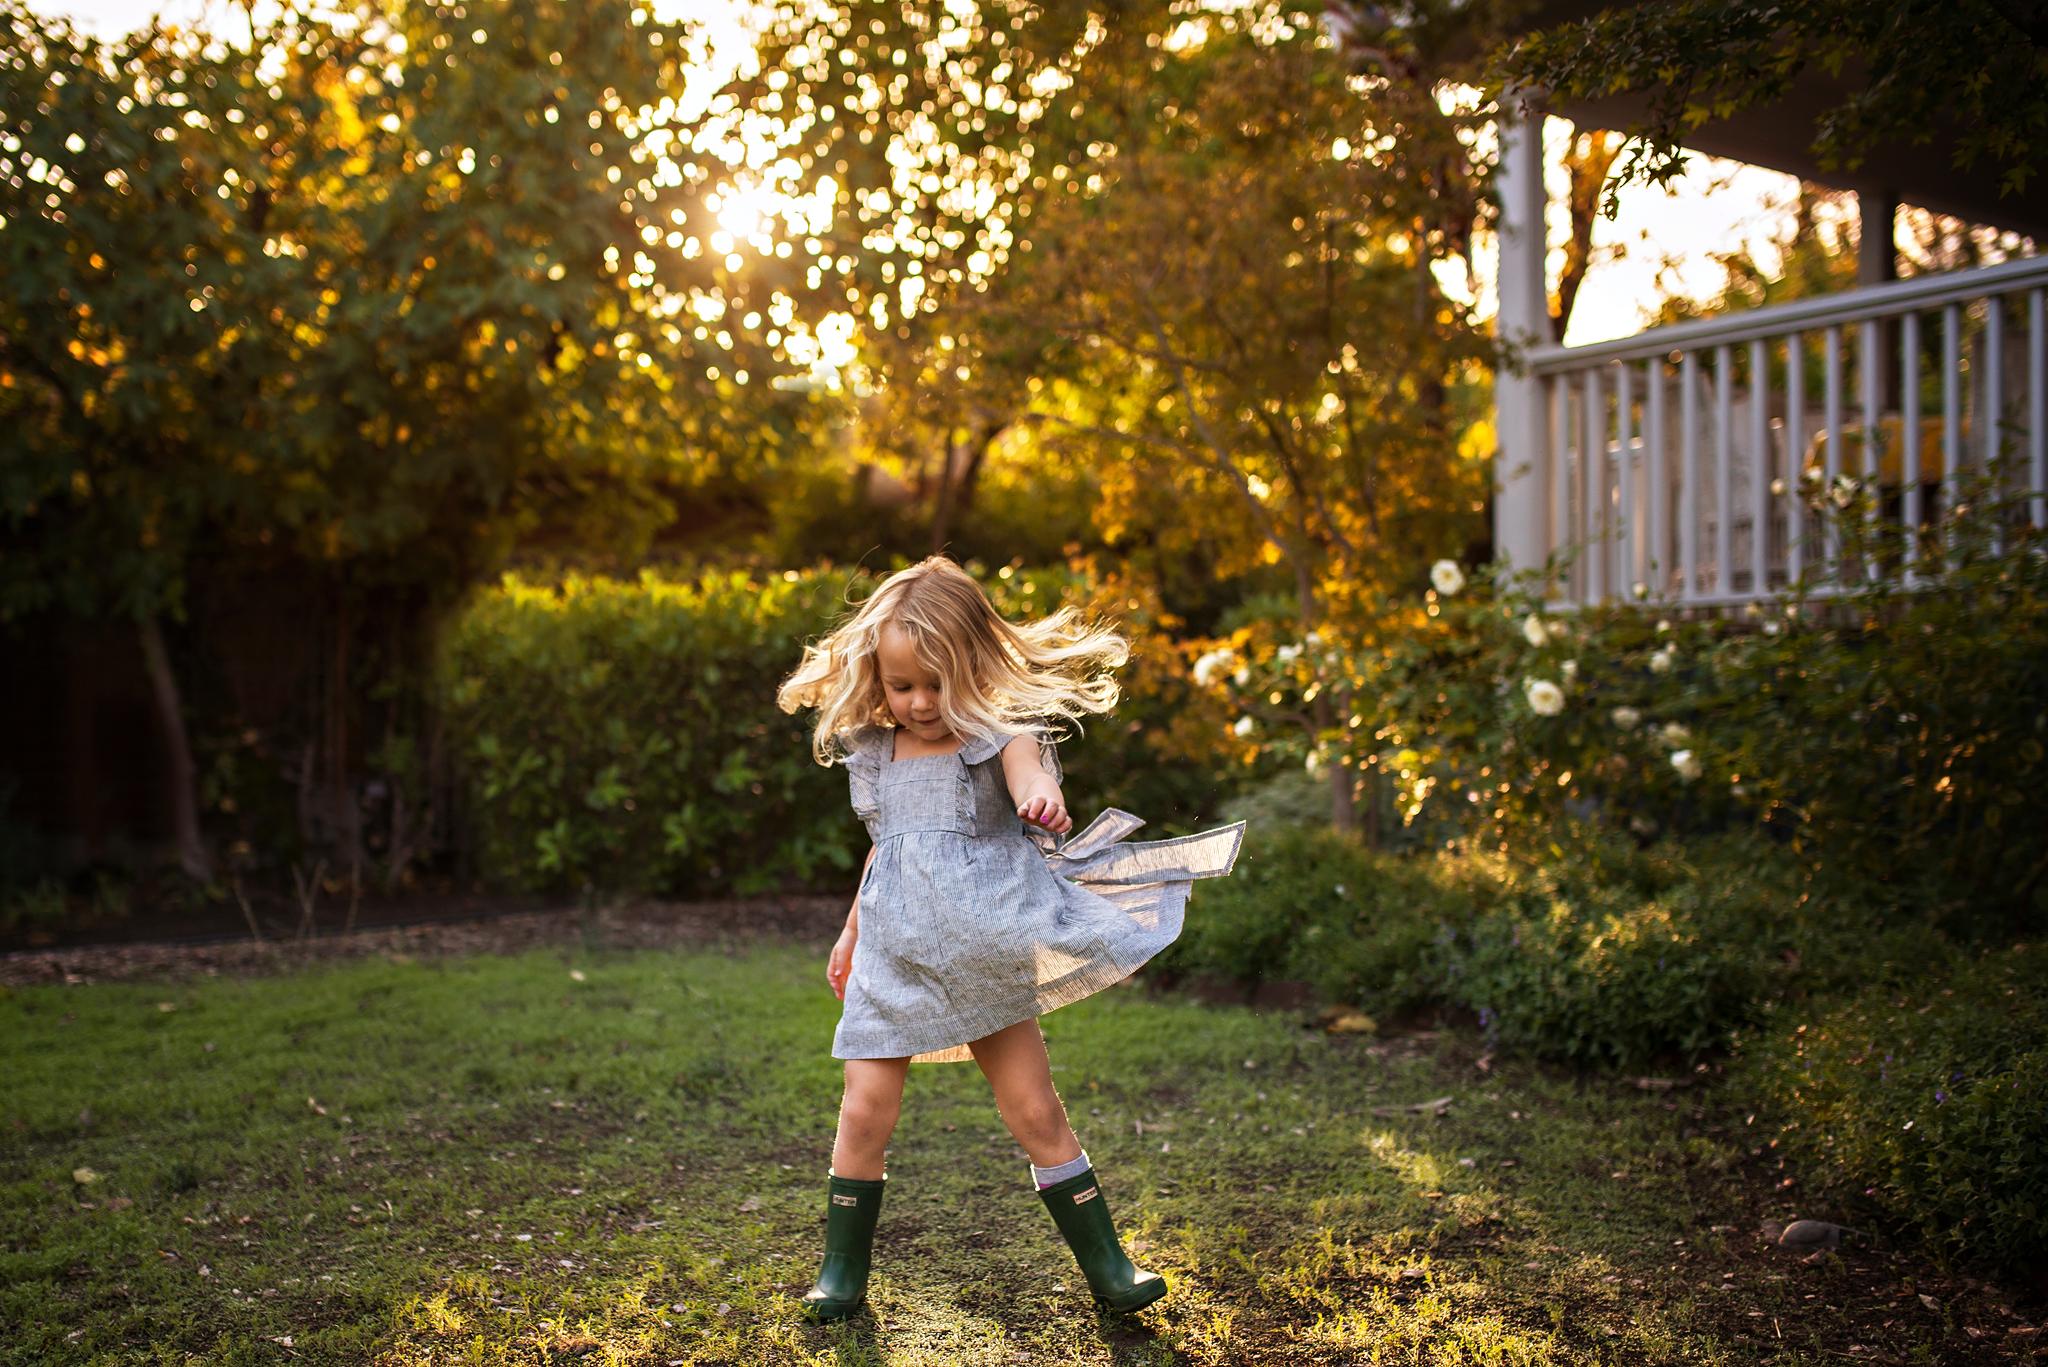 Justine Di Fede Photography   Fall Kids   2016a.jpg